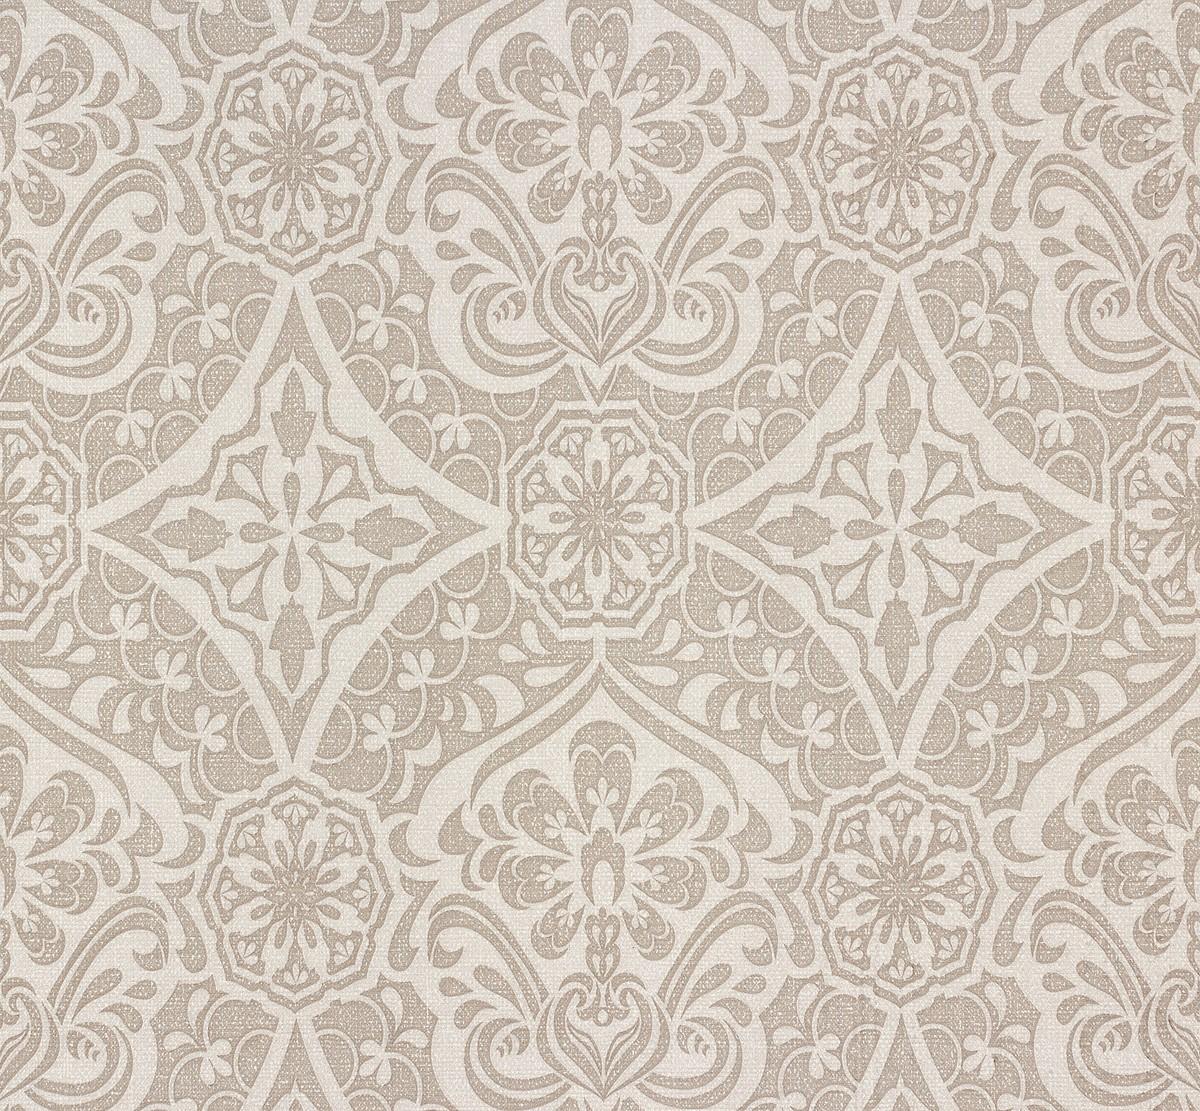 wallpaper sinfonia p s ornaments grey 02388 40. Black Bedroom Furniture Sets. Home Design Ideas